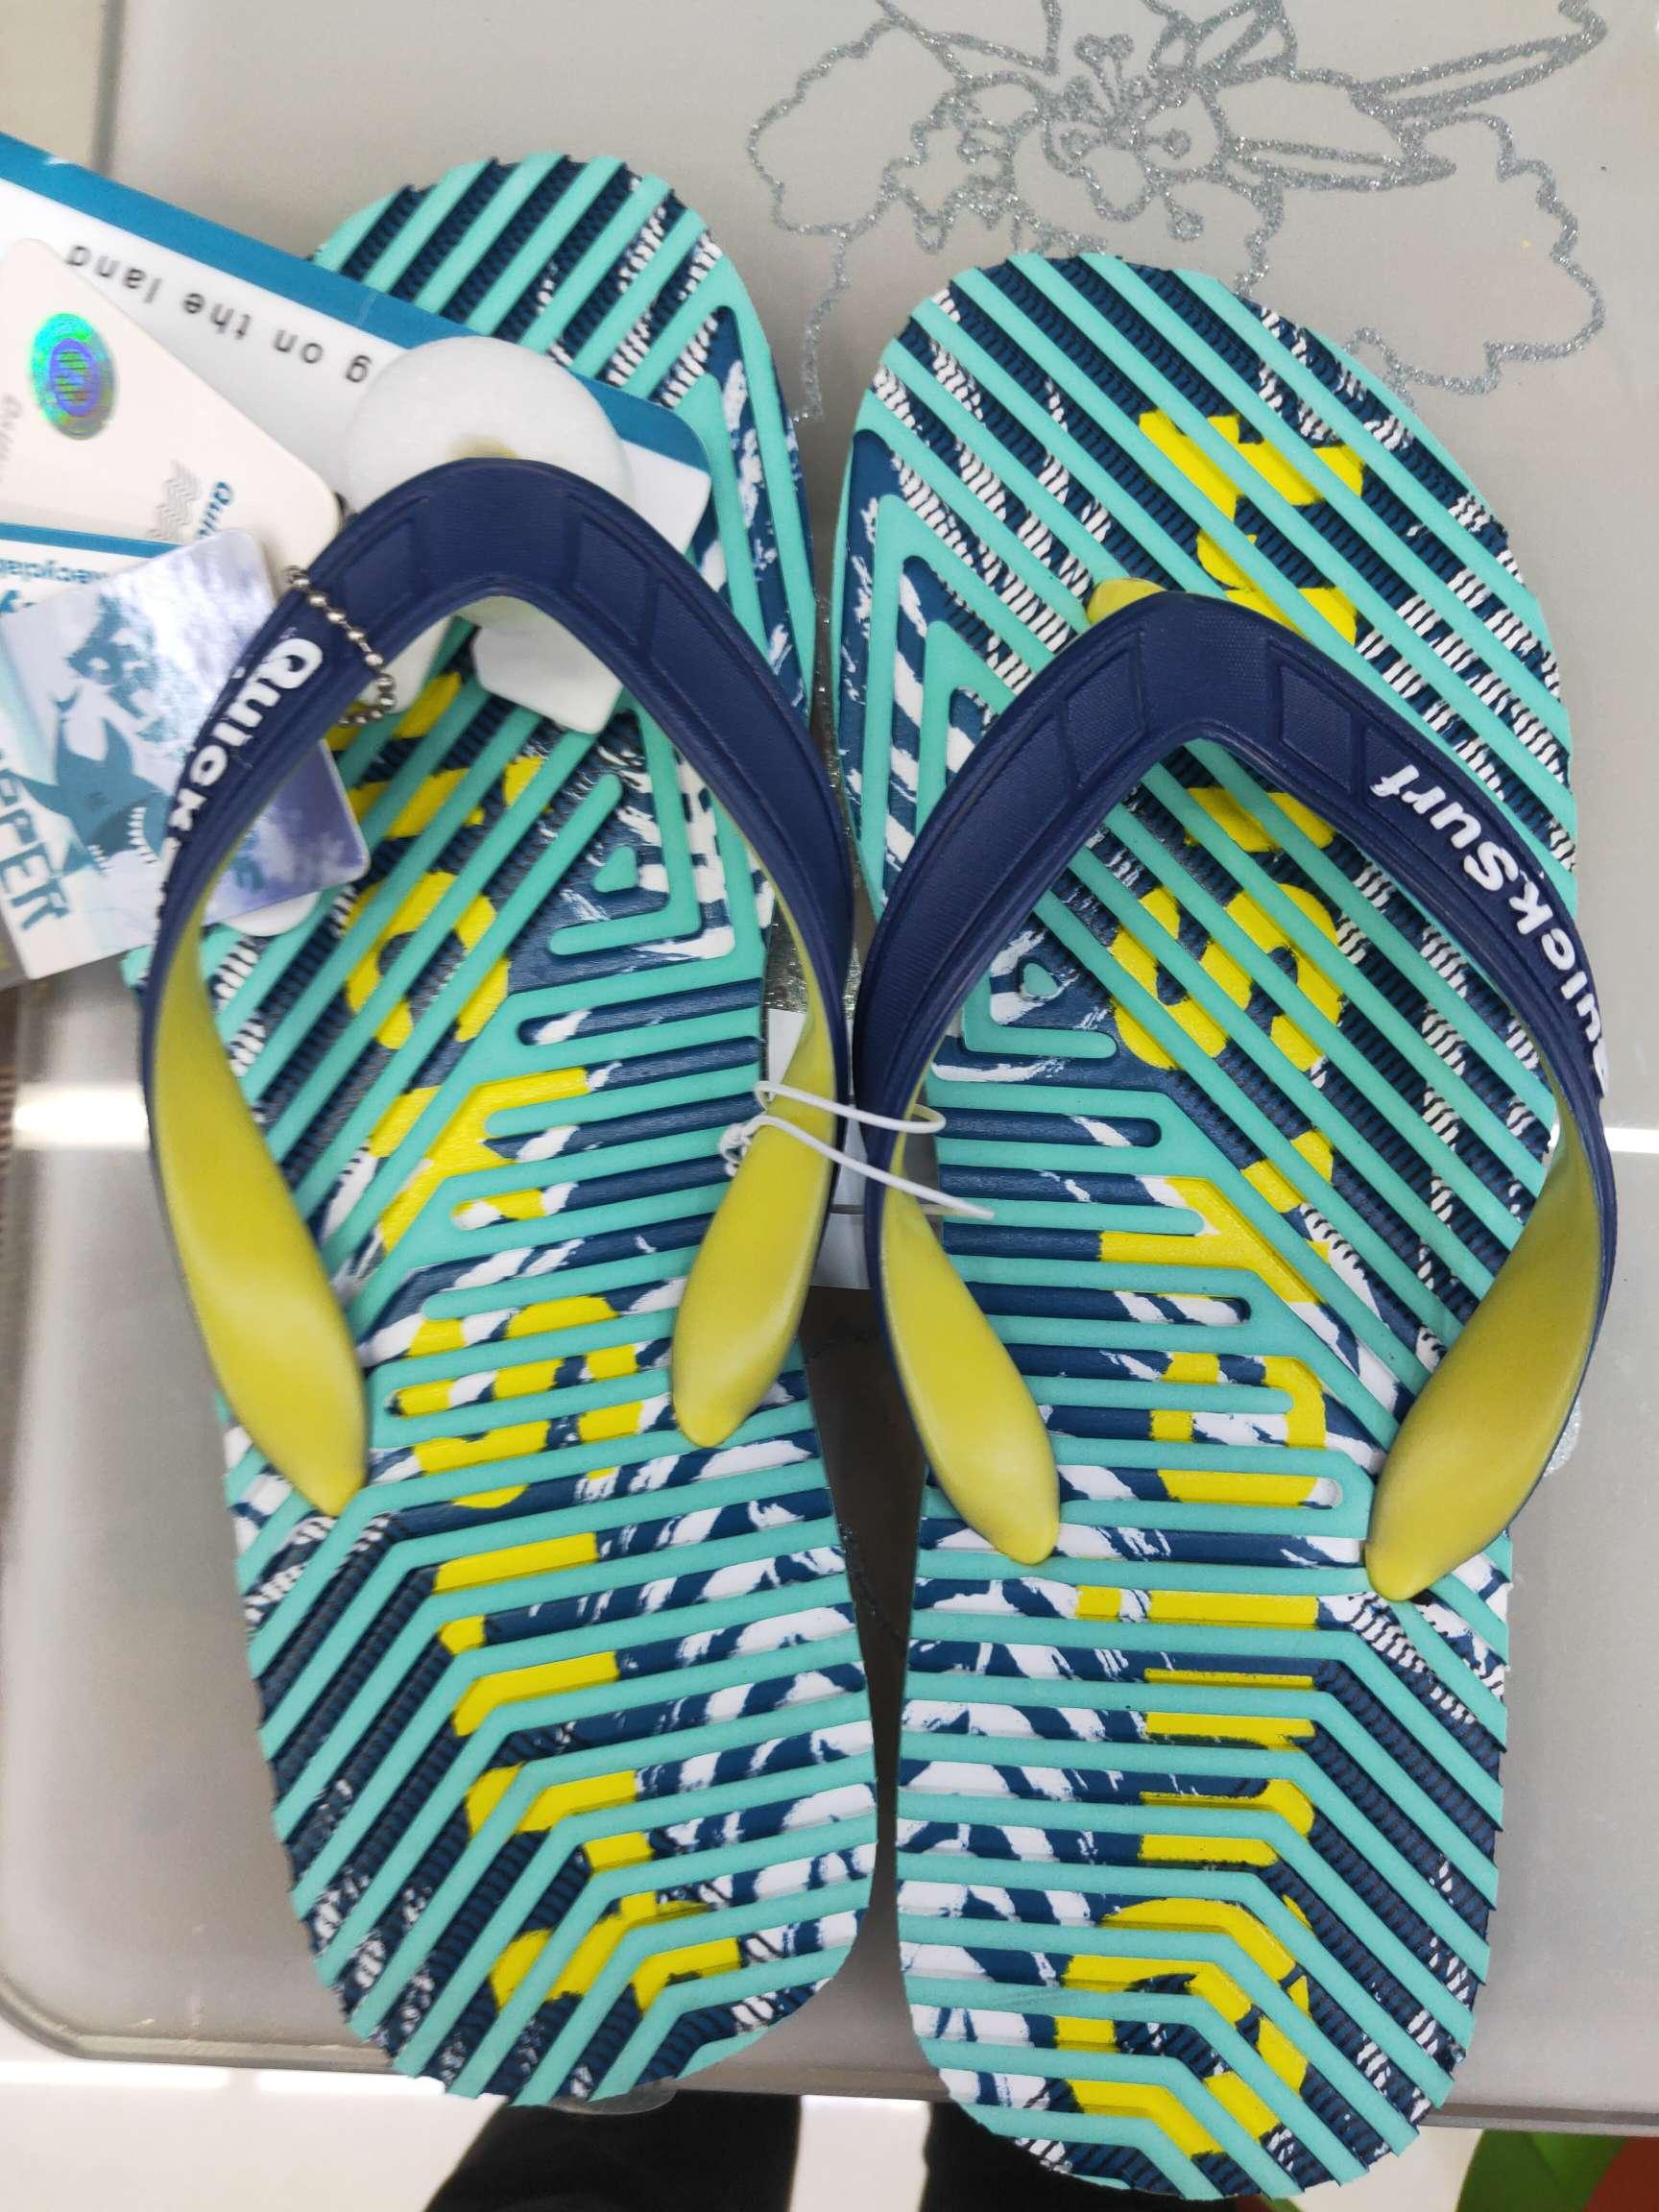 YF一帆鞋业,经典百搭舒适不挤脚男女沙滩鞋经典百搭舒适爆款拖鞋456条4535322333